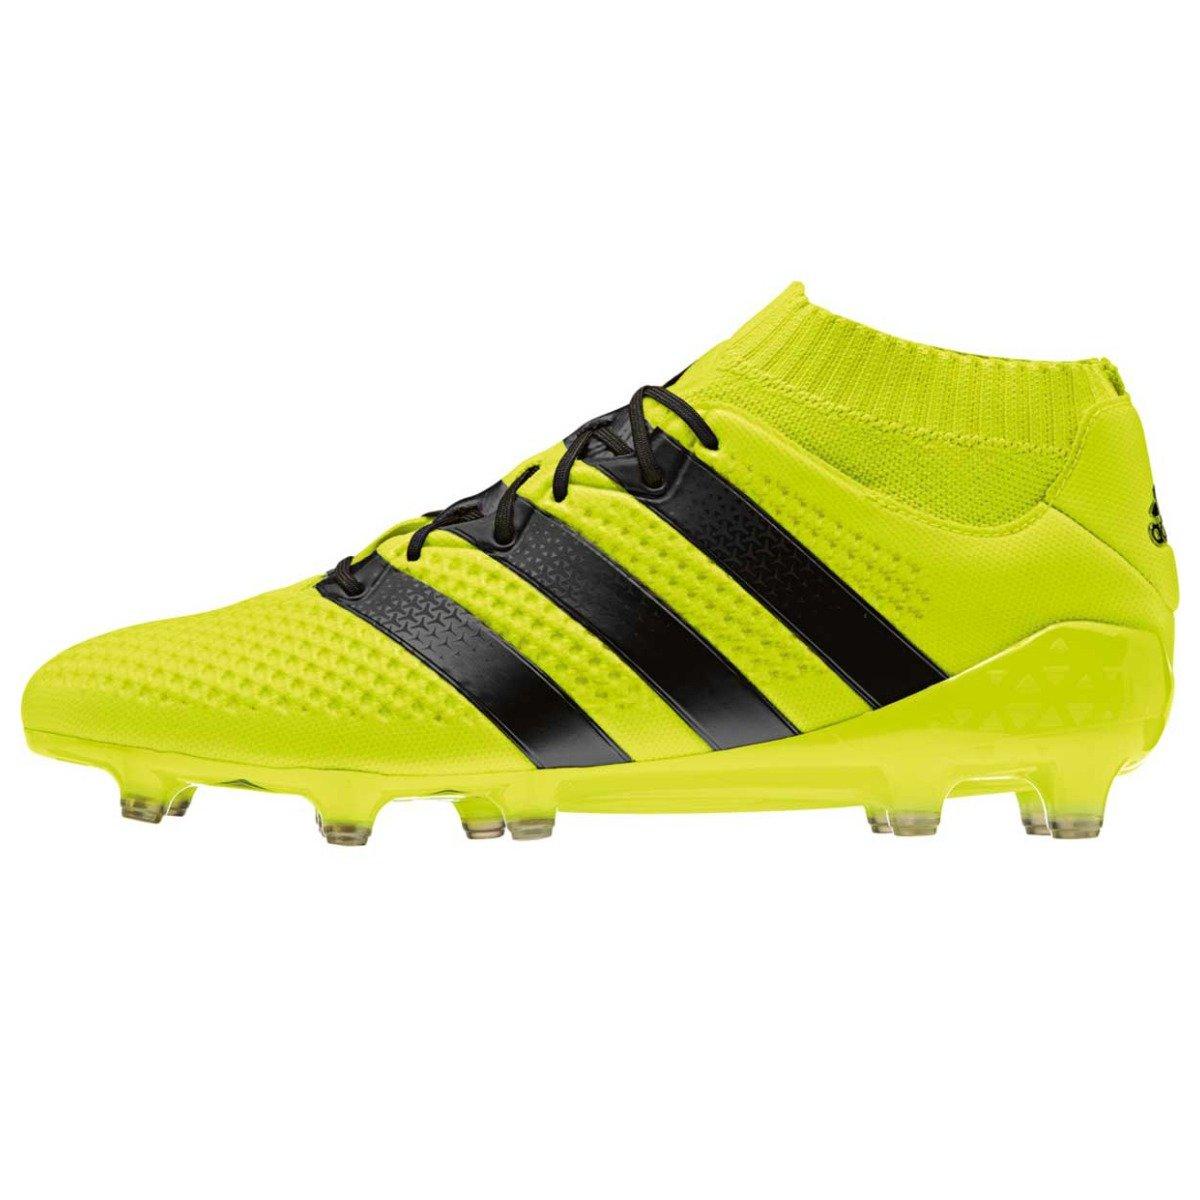 Adidas Ace 16,1 Primeknit festen Boden, Klampen